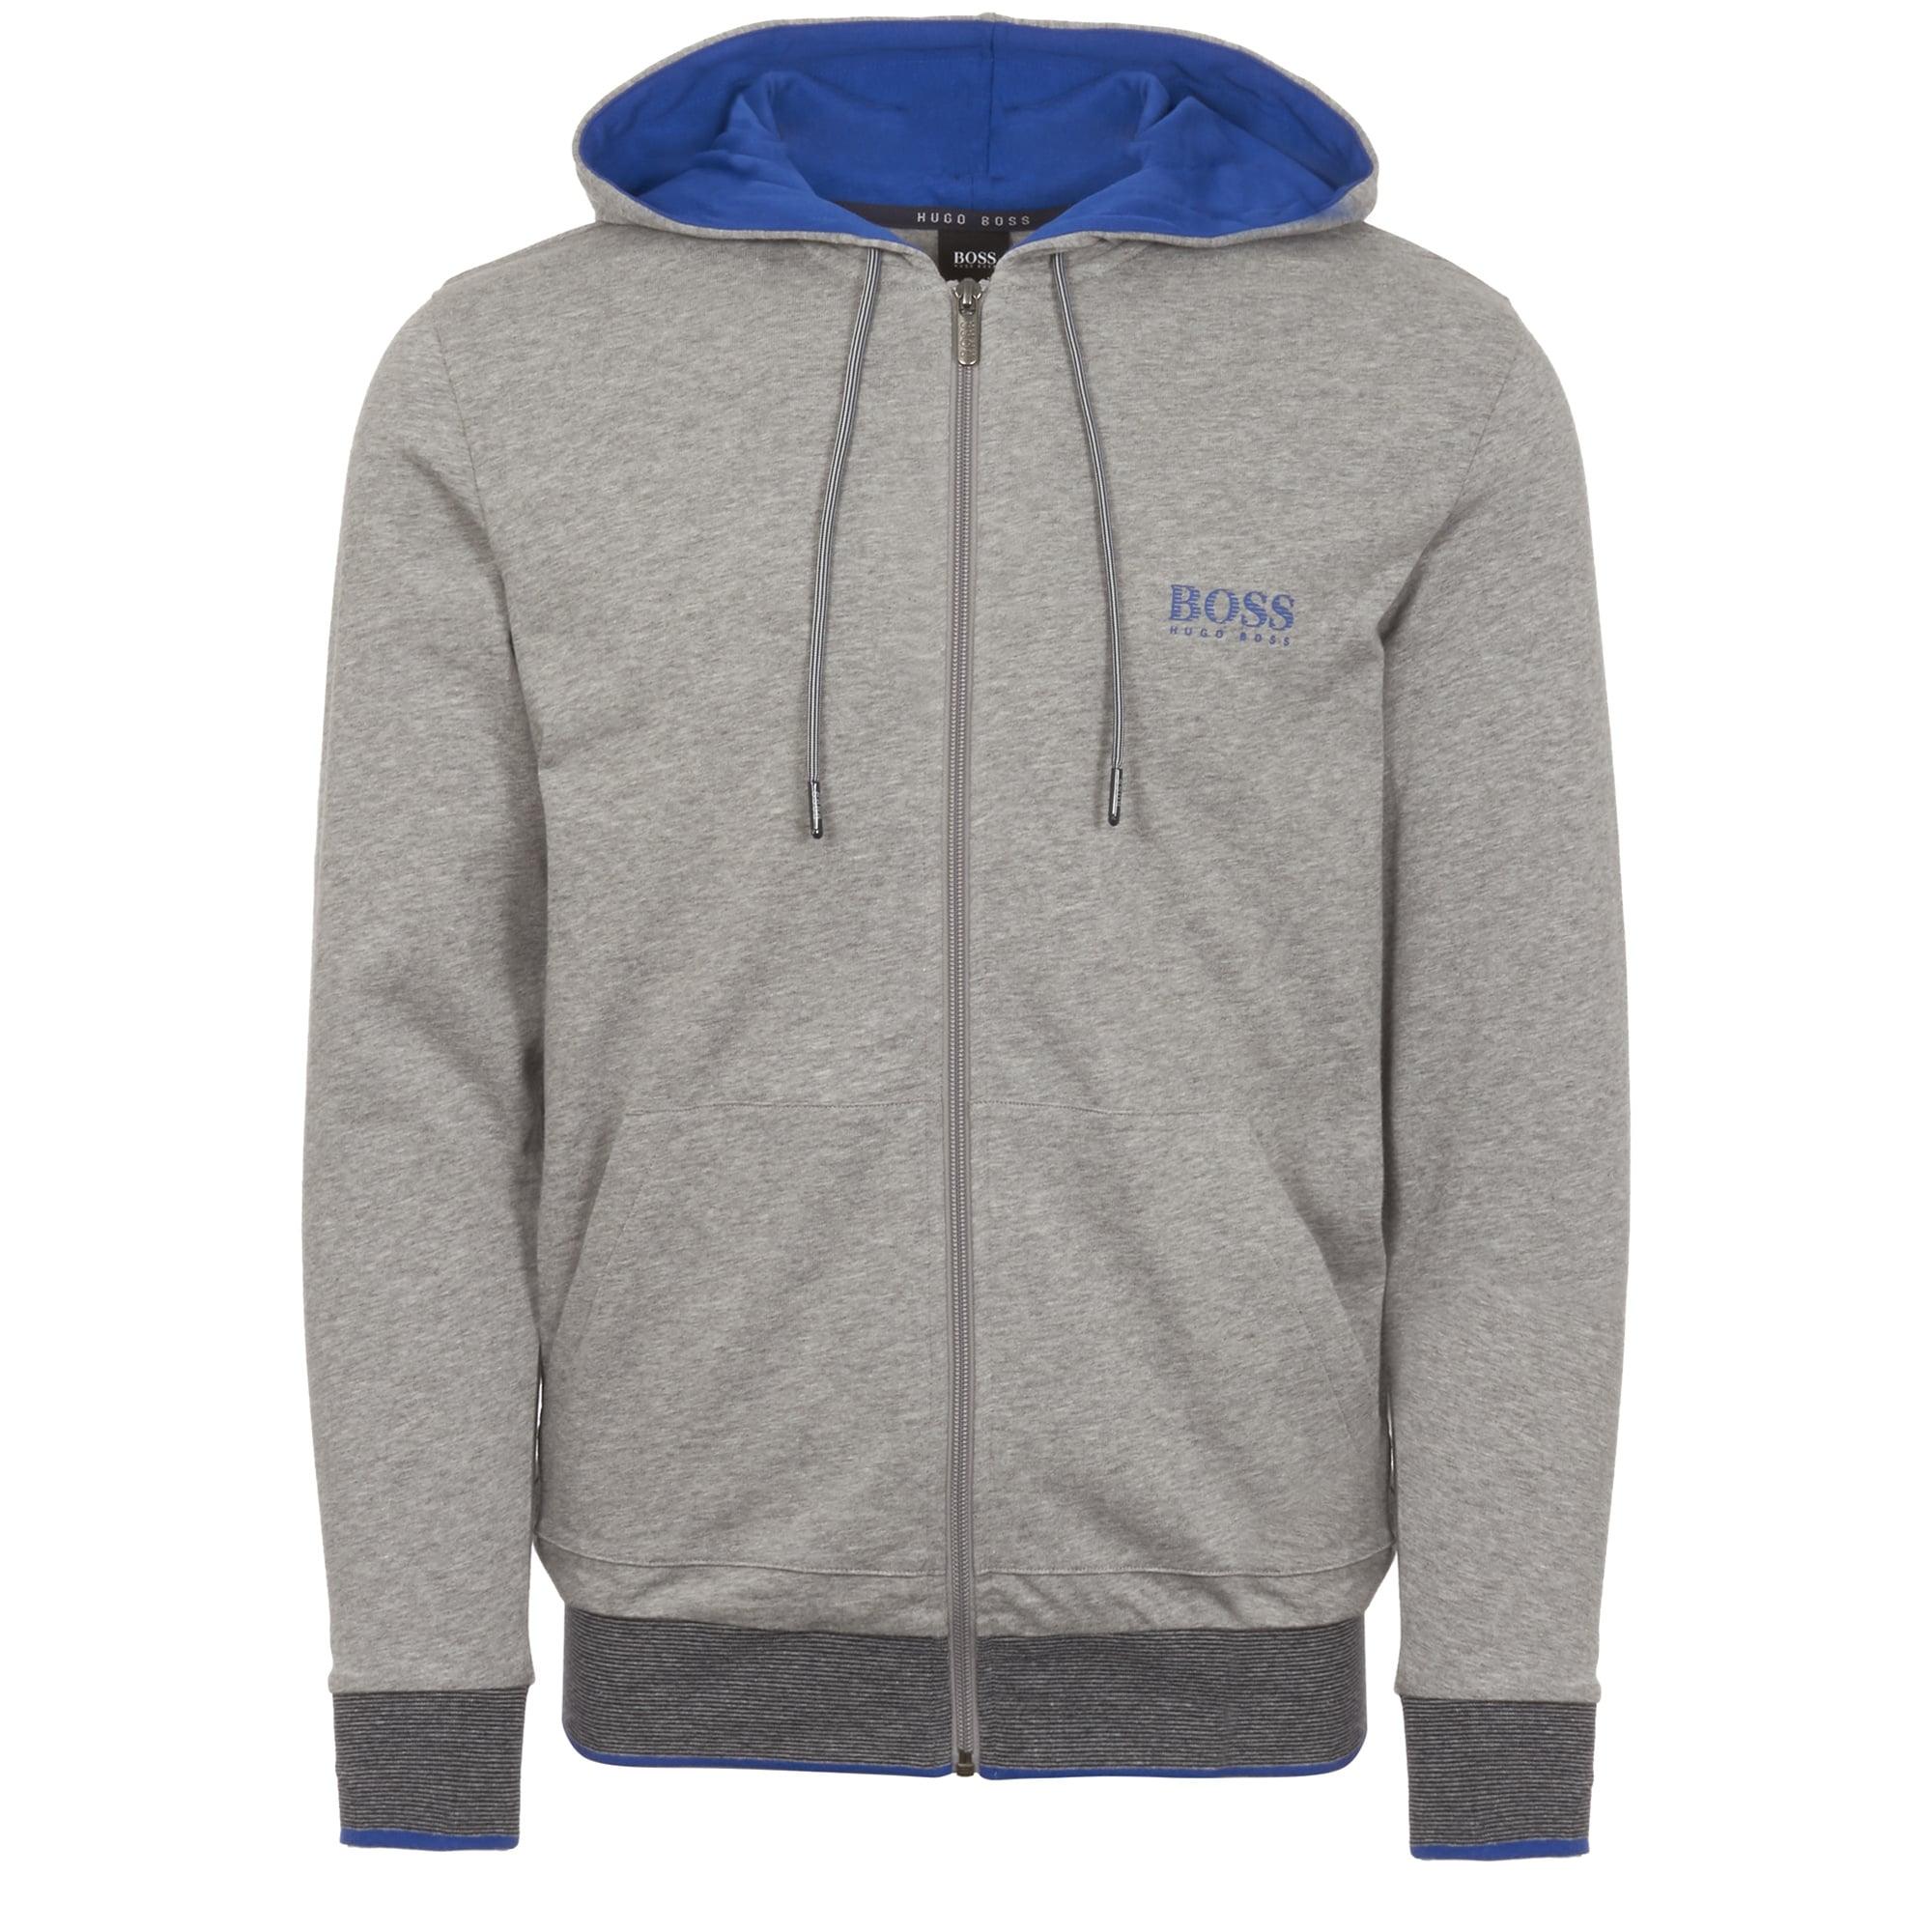 77625fecec5 Hugo Boss Grey Zip through hooded sweatshirt 50372009-GRY